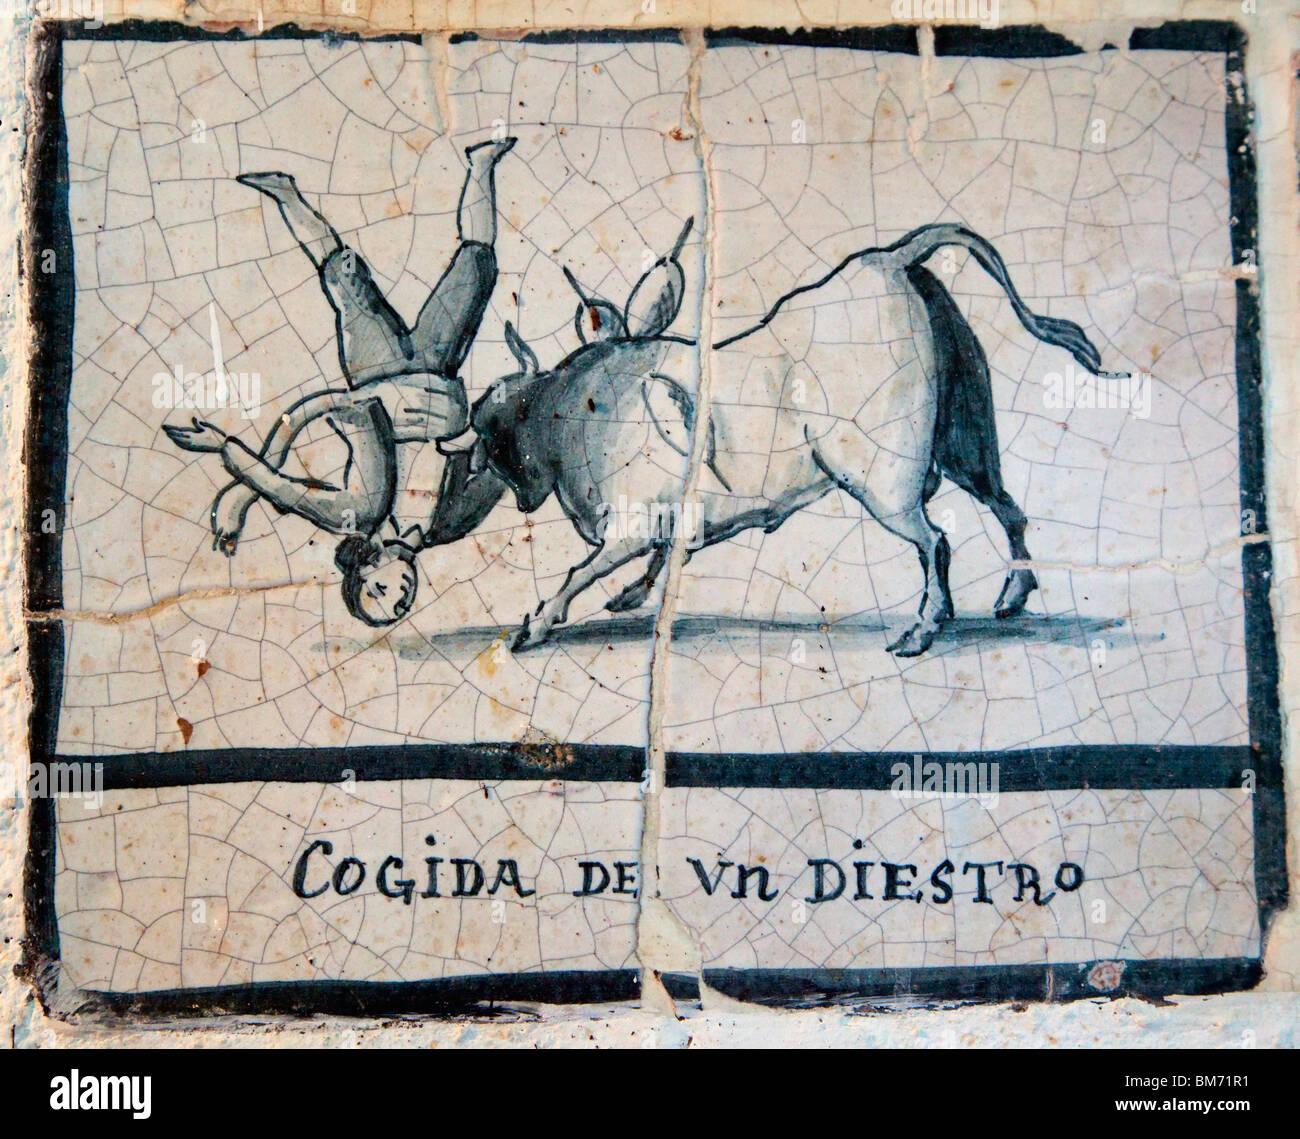 Lovely 1 Inch Hexagon Floor Tiles Thin 12X12 Floor Tiles Round 12X24 Ceramic Tile Patterns 2 X 12 Ceramic Tile Young 2X6 Subway Tile Black3D Ceiling Tiles Malaga Costa Del Sol, Spain. Bullfight Scene On Antique Ceramic Tile ..